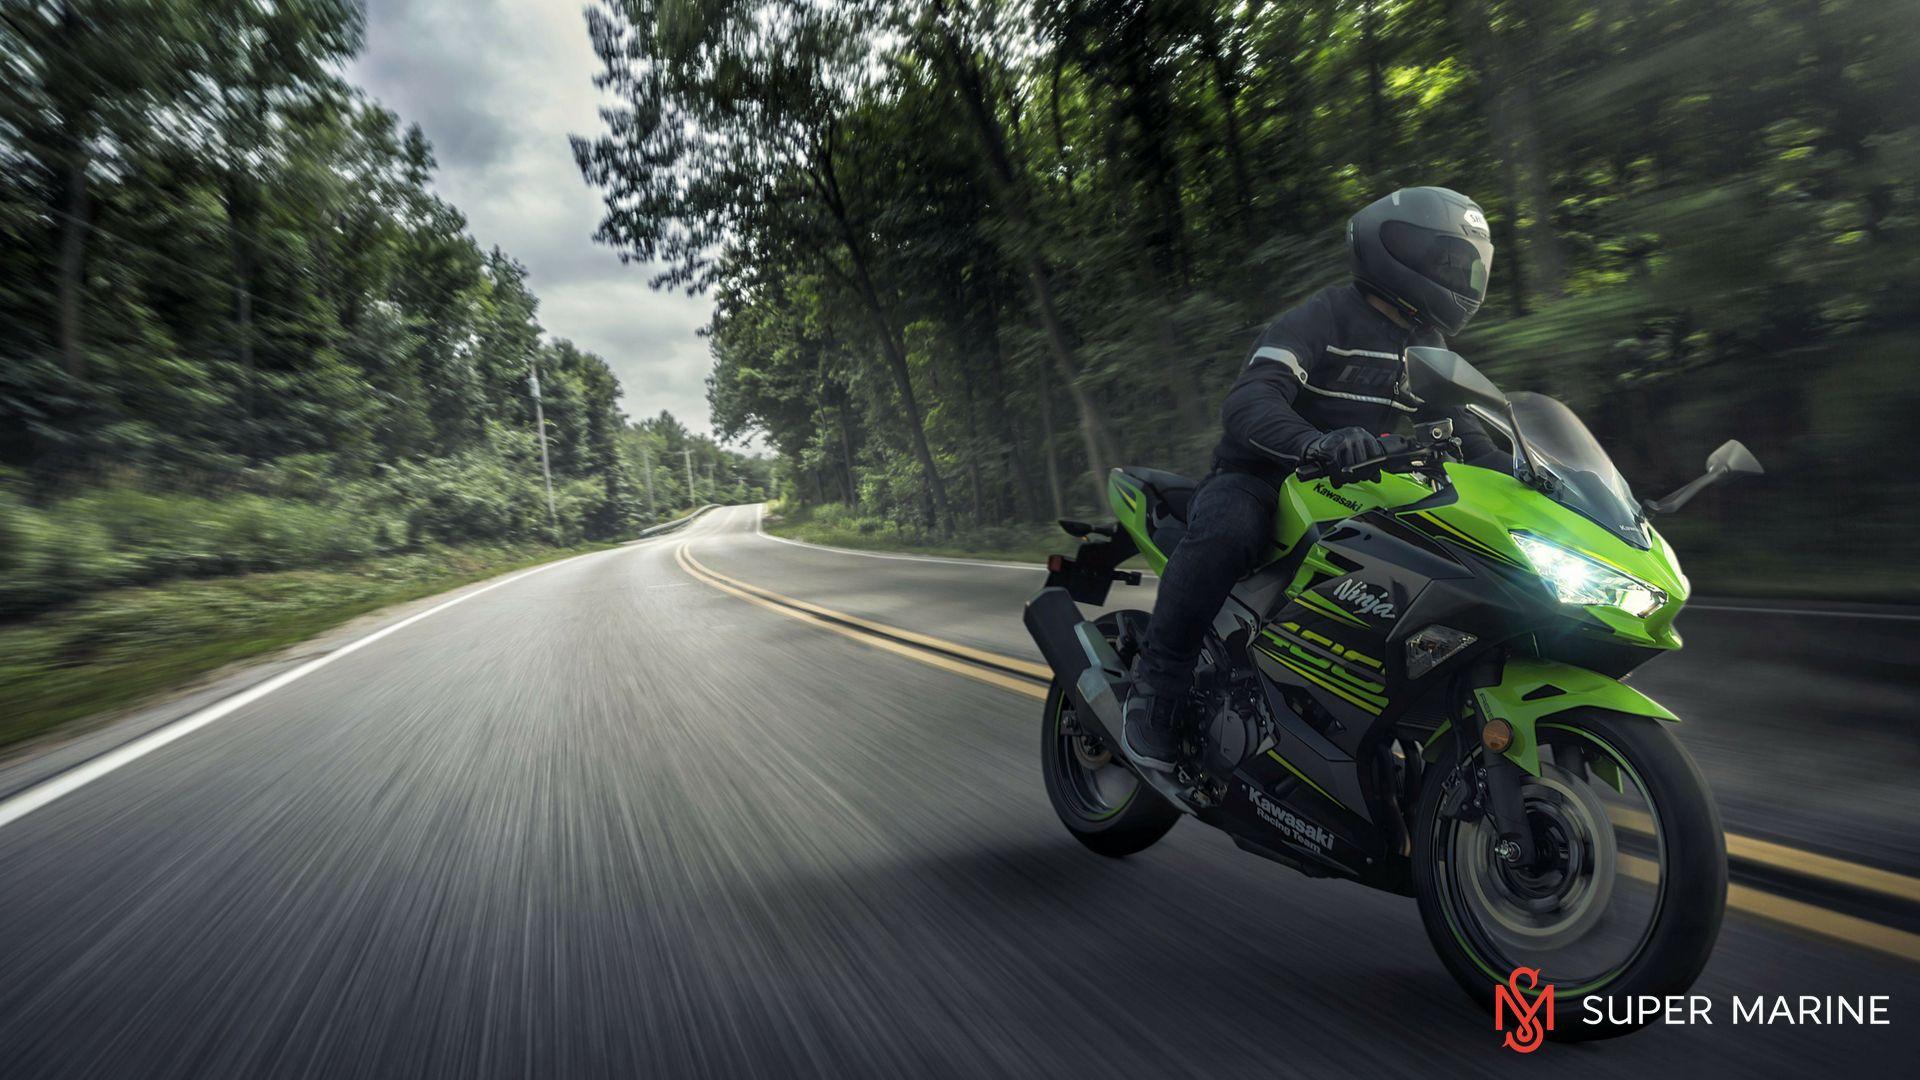 Мотоцикл Kawasaki Ninja 400 Зеленый 2020 - 7